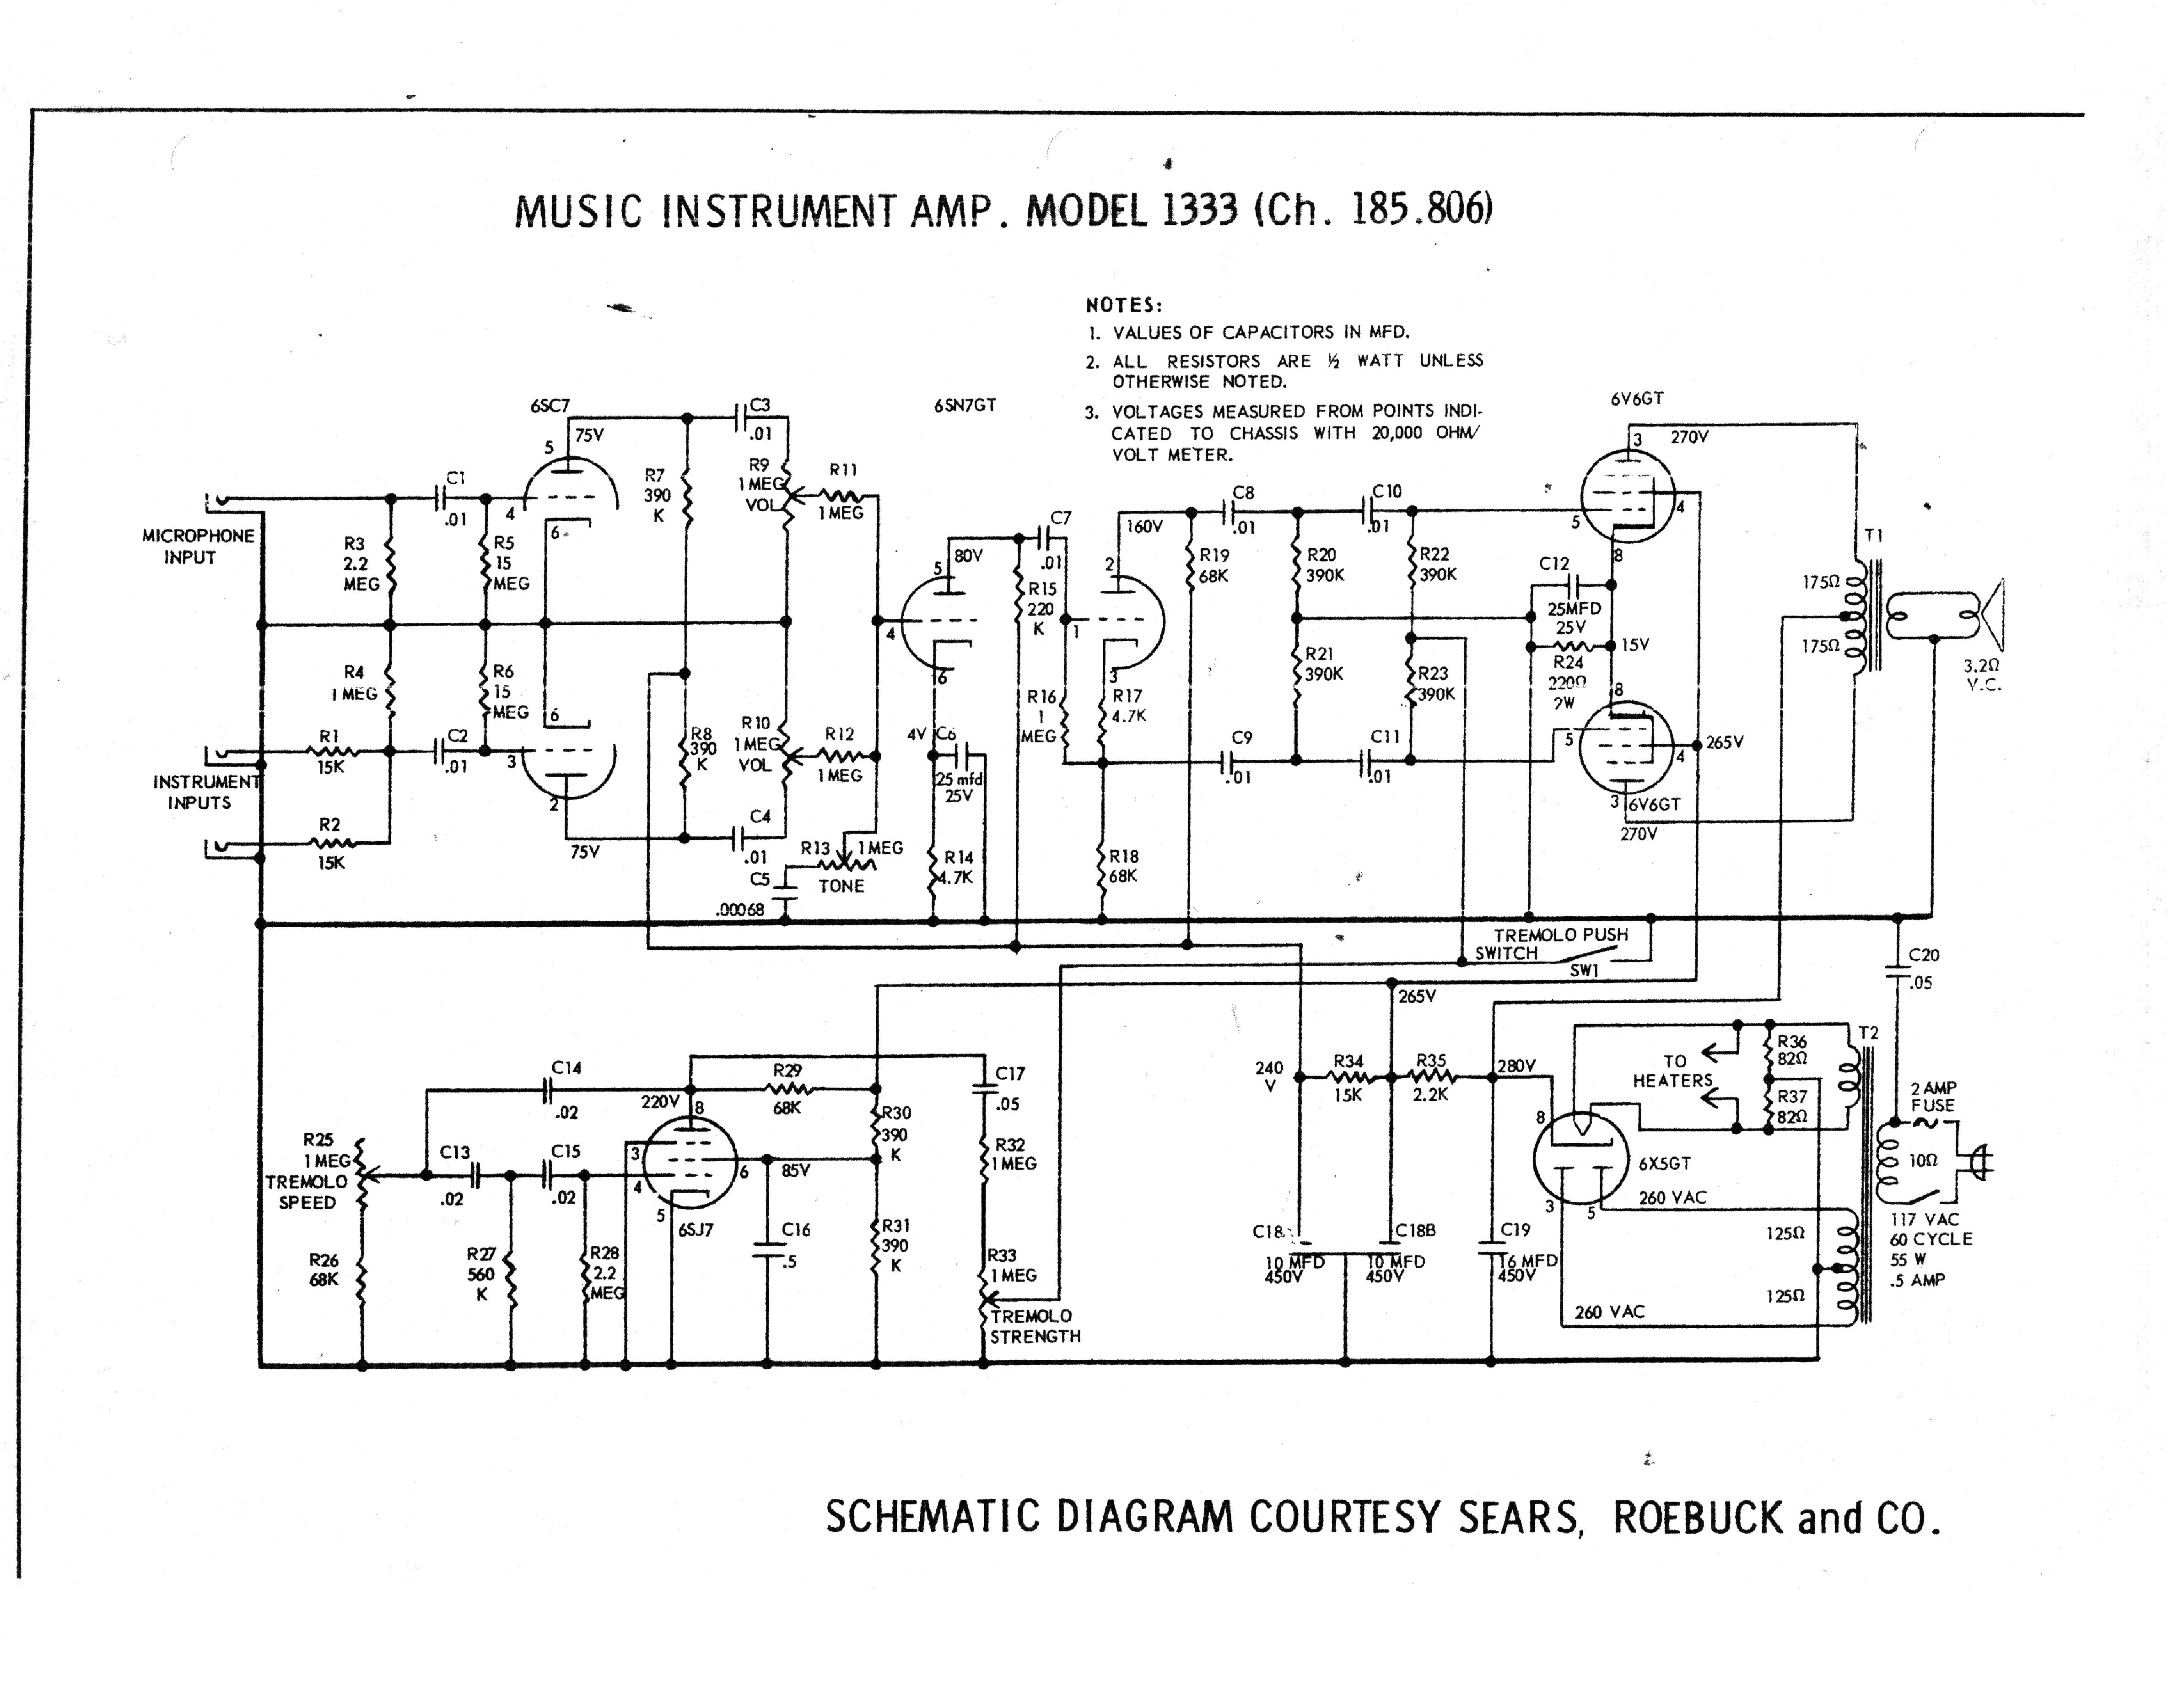 Silvertone 1333 Sch Service Manual Download Schematics Eeprom 1457 Wiring Diagram 1st Page